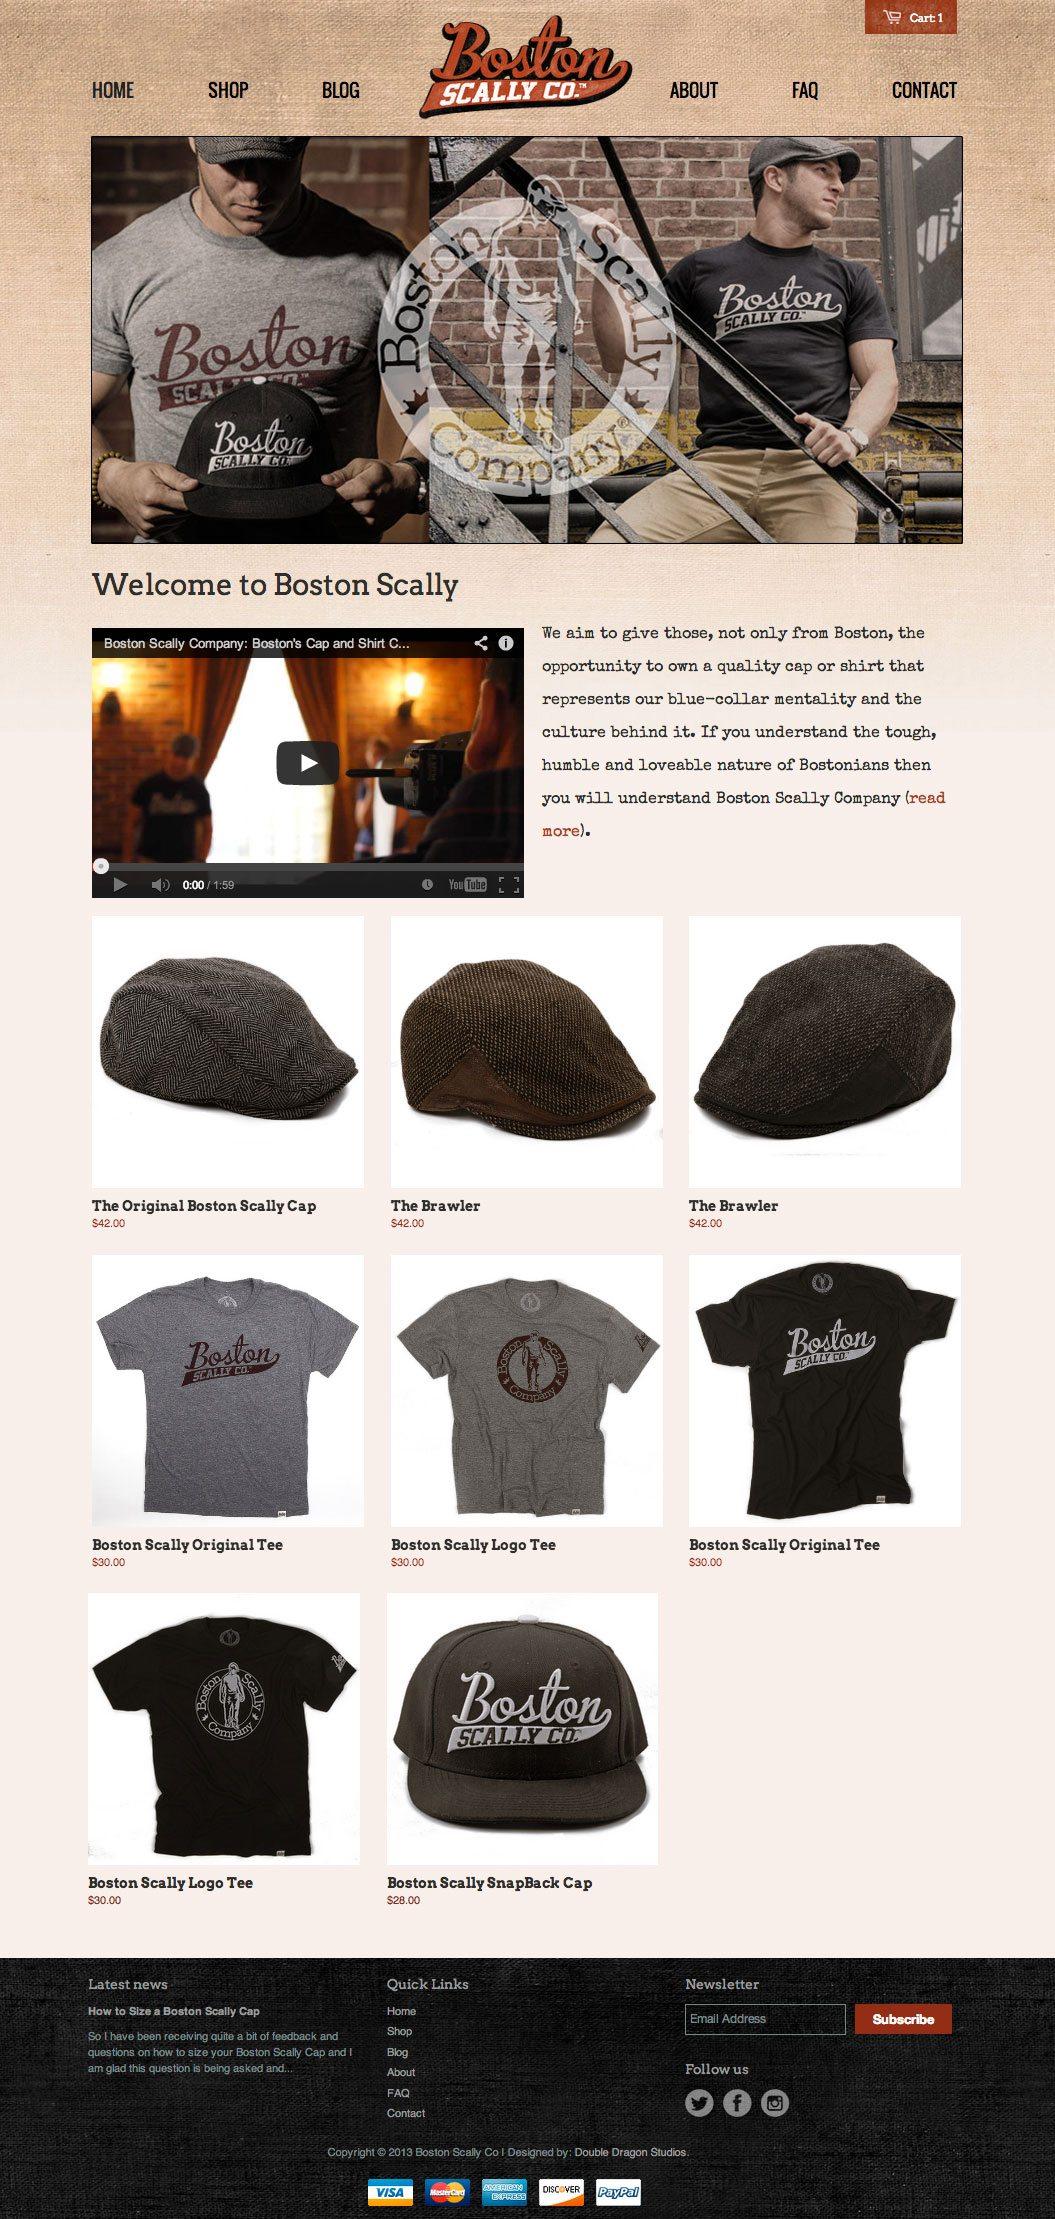 a51c8e04765 boston-scally-shopify – How to start a clothing company